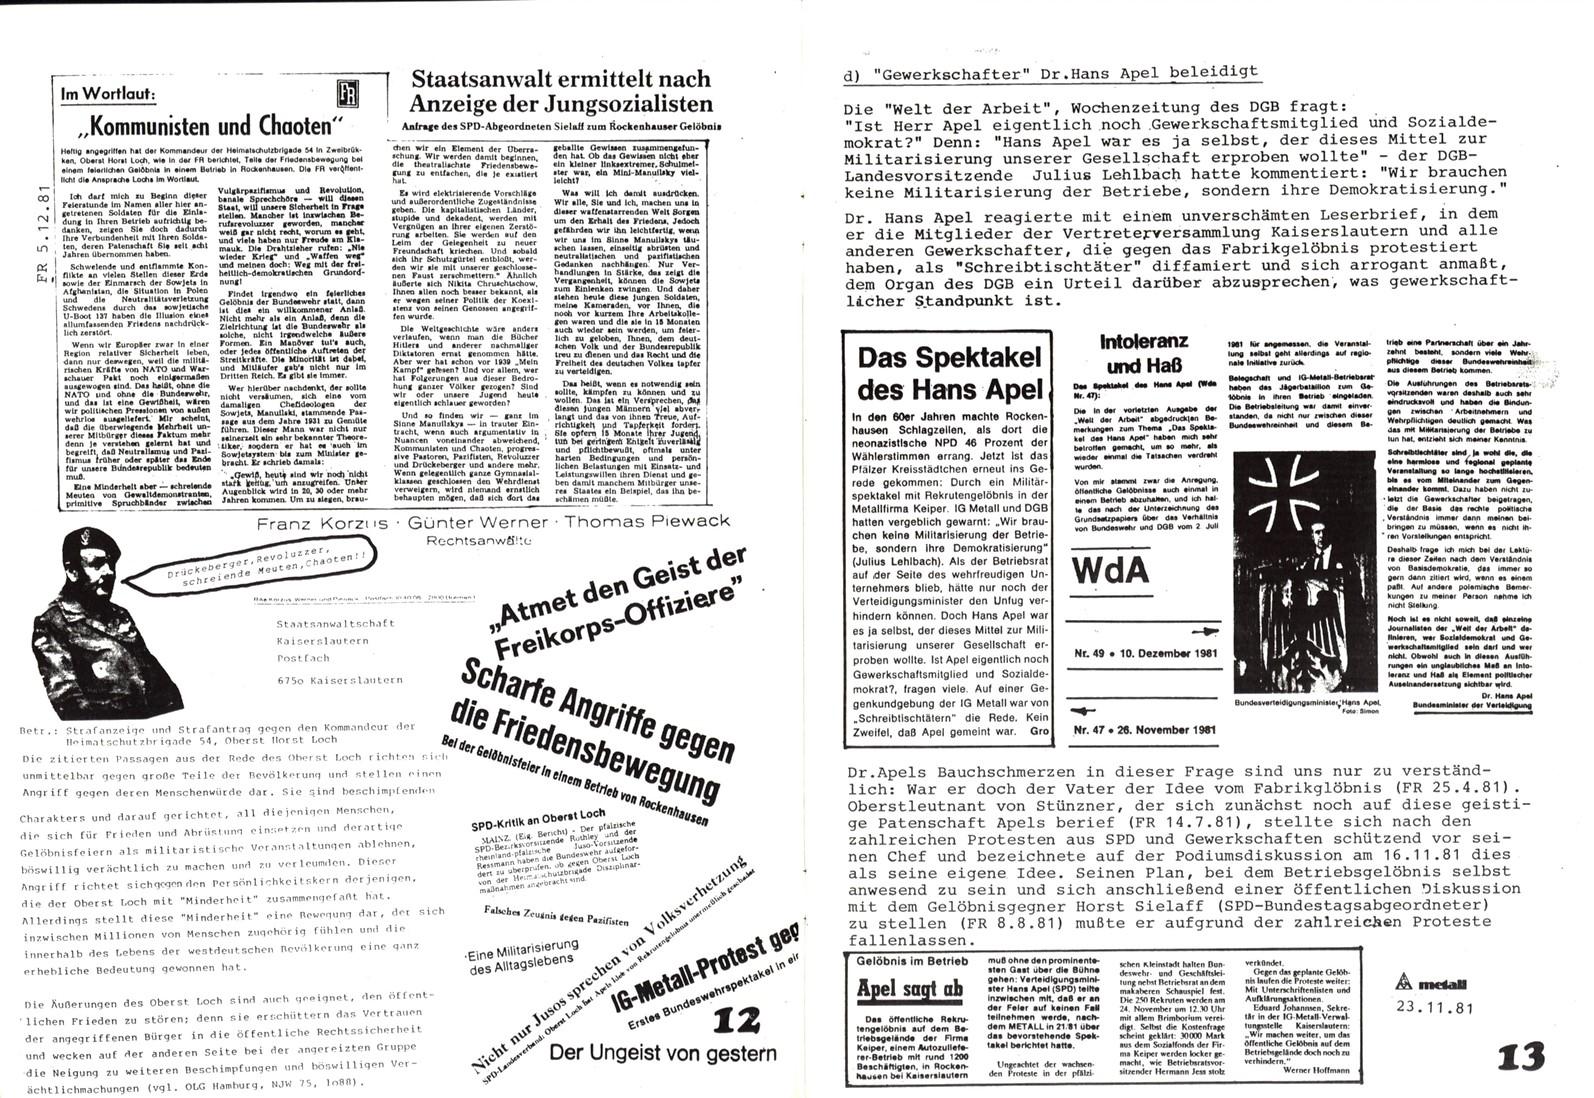 Mainz_AB_1982_Doku_Rockenhausen_08